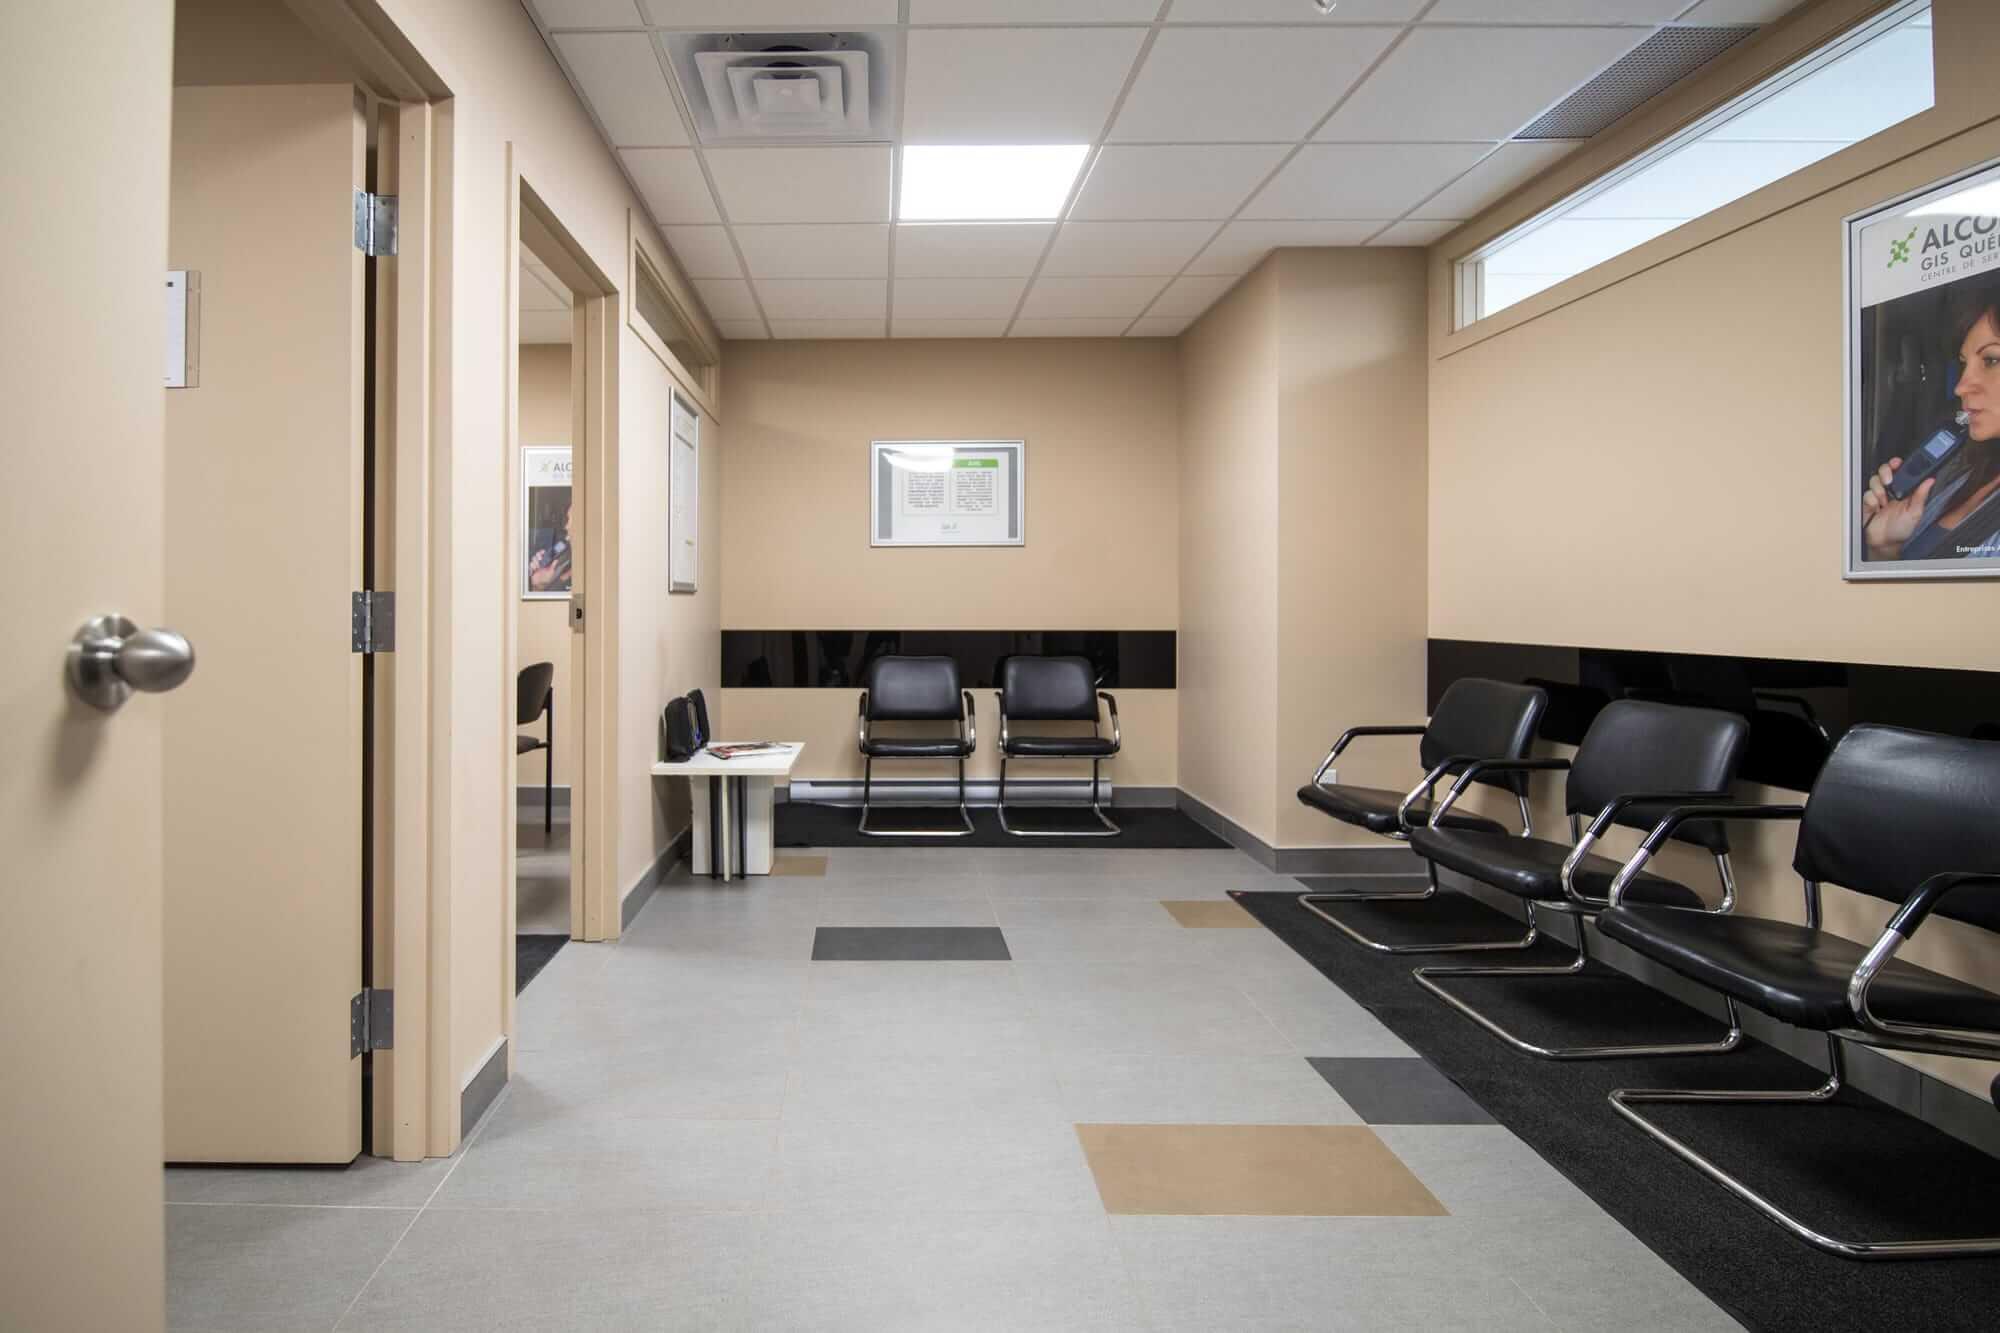 commercial interior design - waiting room